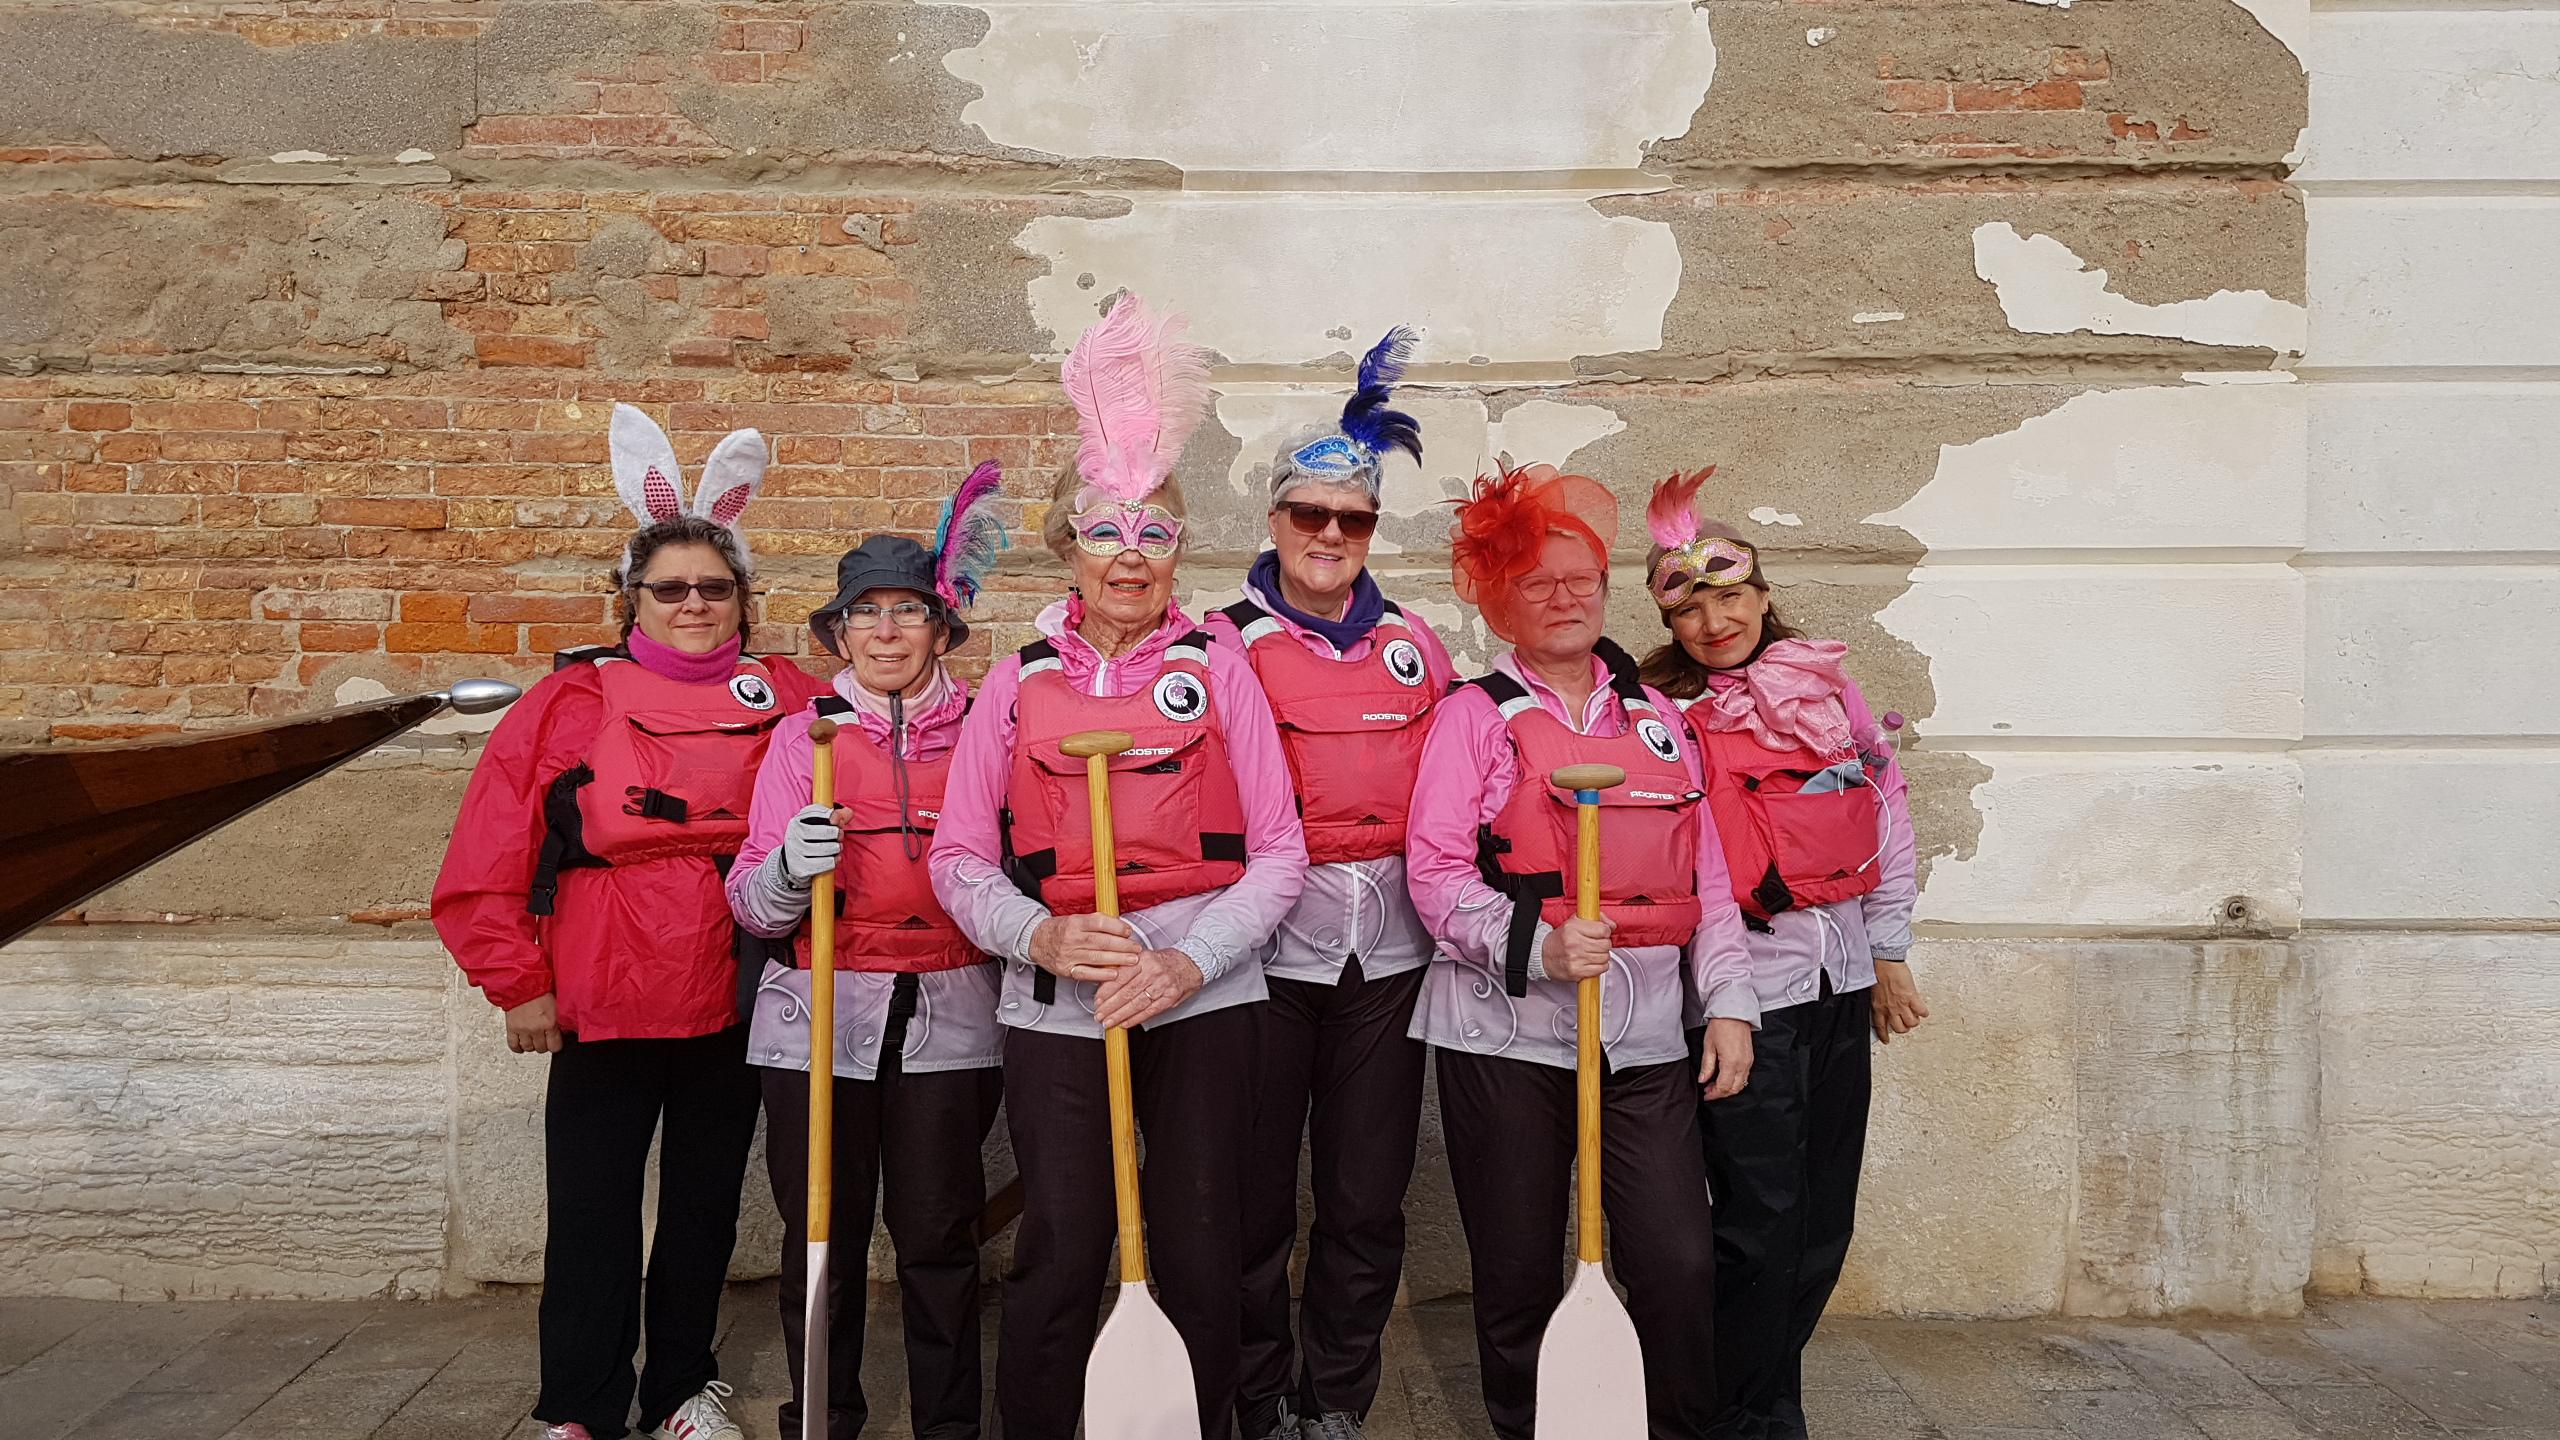 Corteo Carnevale_20180128 Pink Lioness